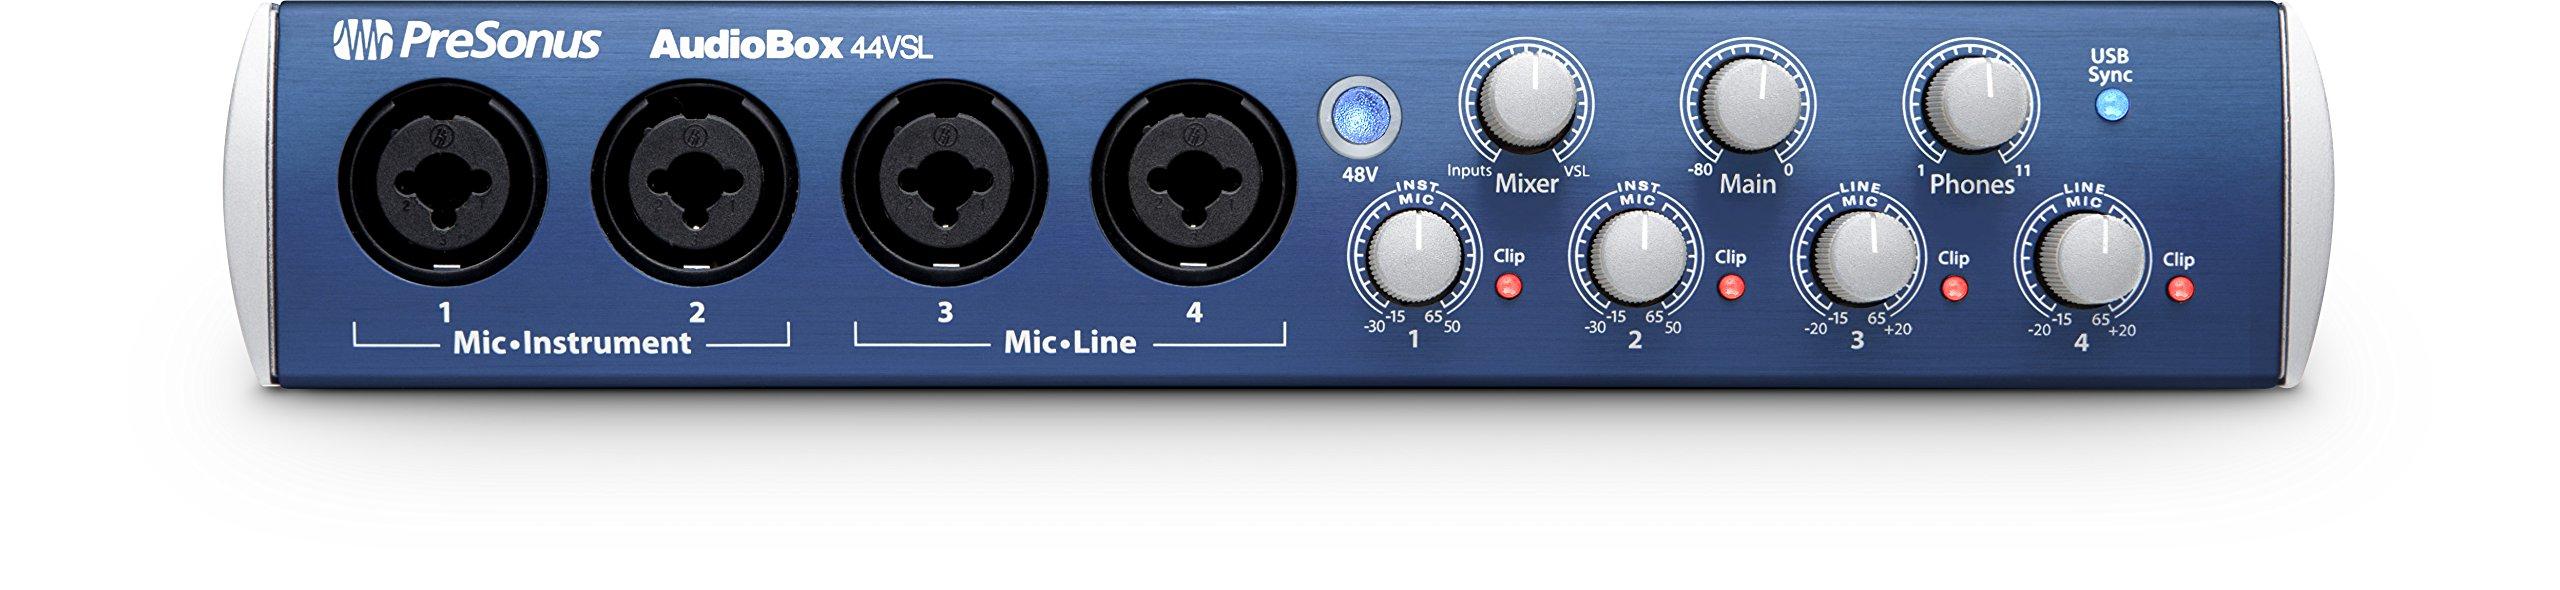 PreSonous Advanced Recording AudioBox 44VSL System